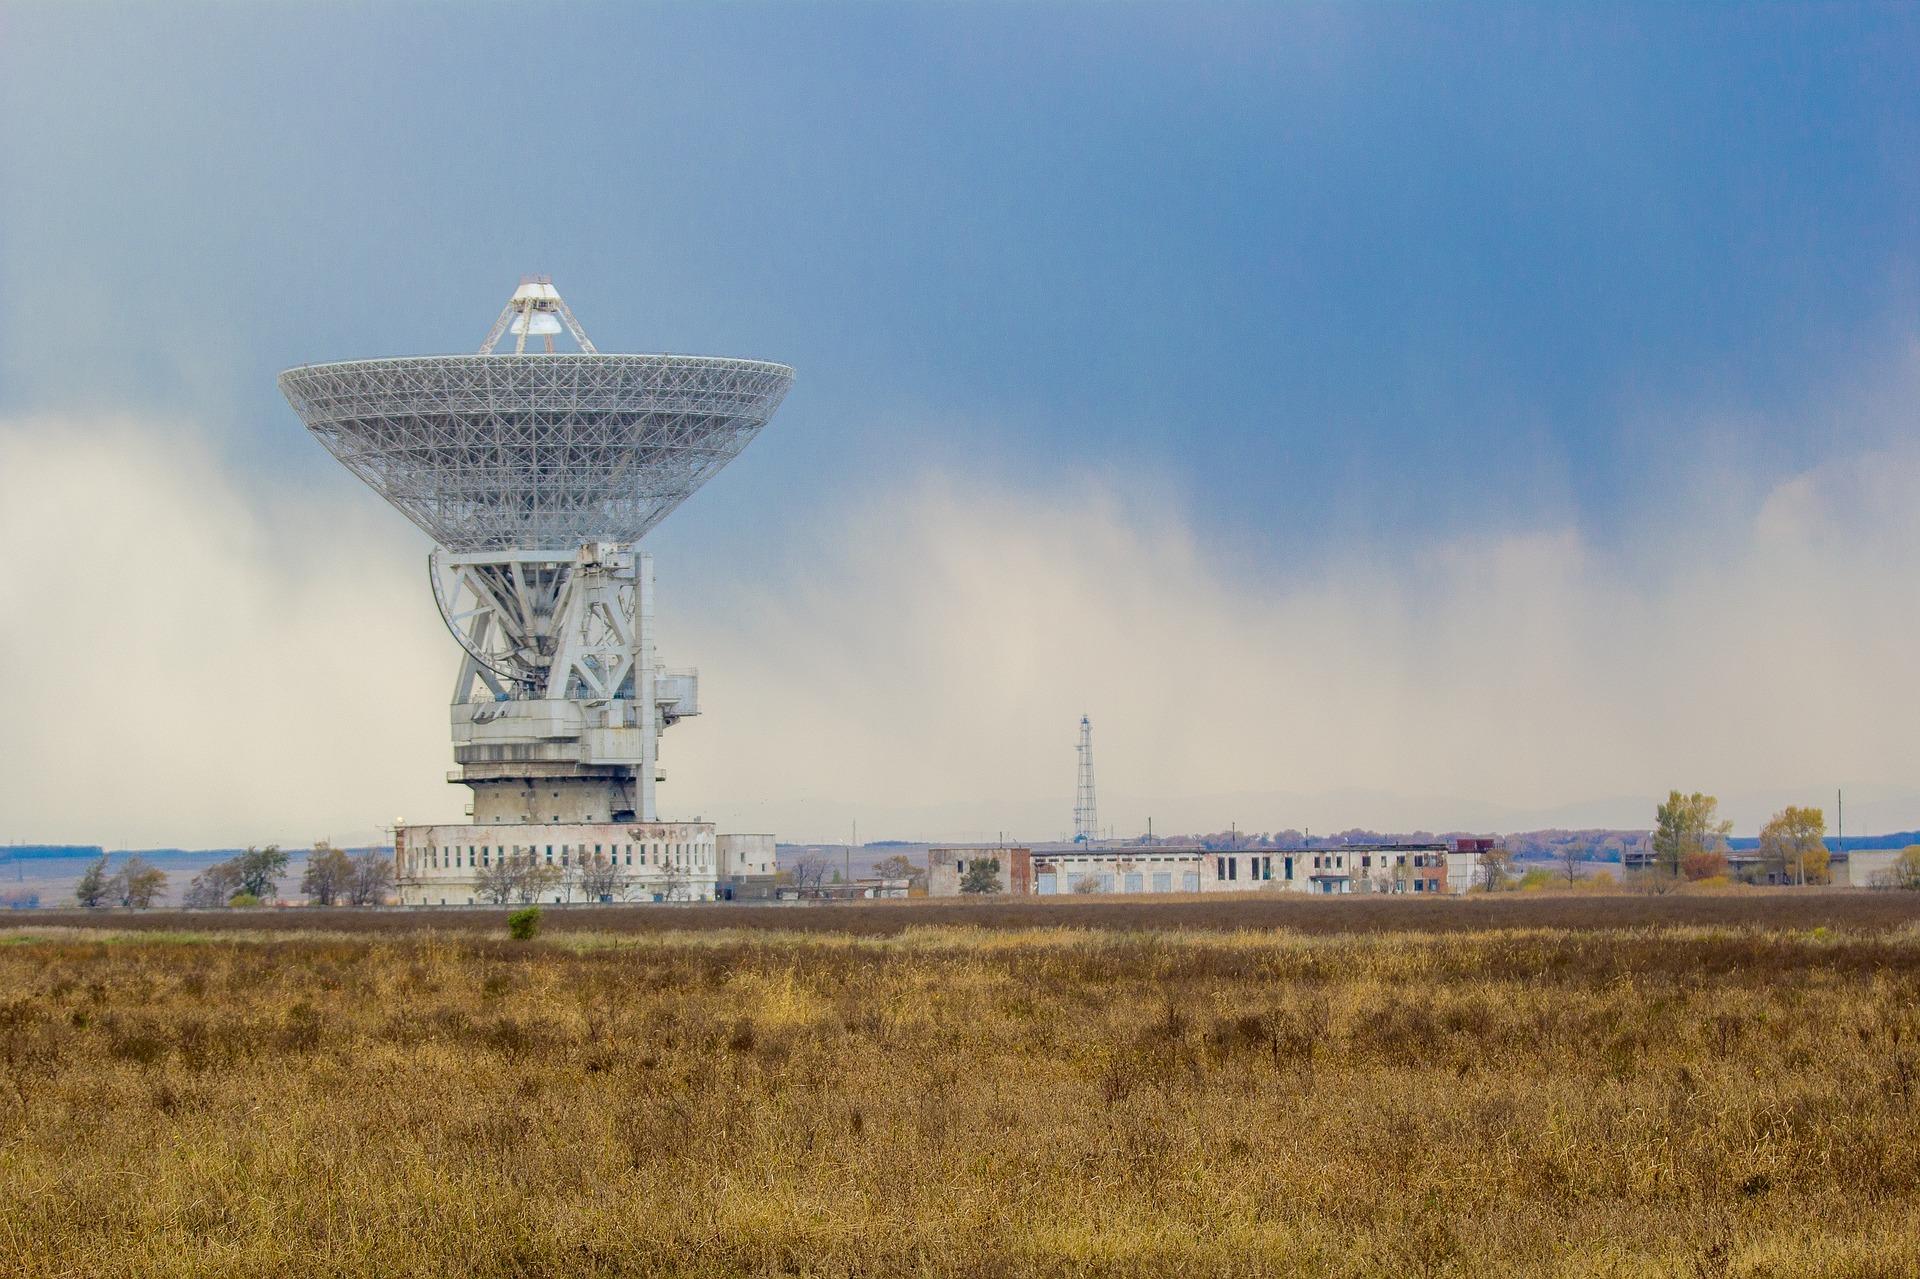 How Does Radar Work?